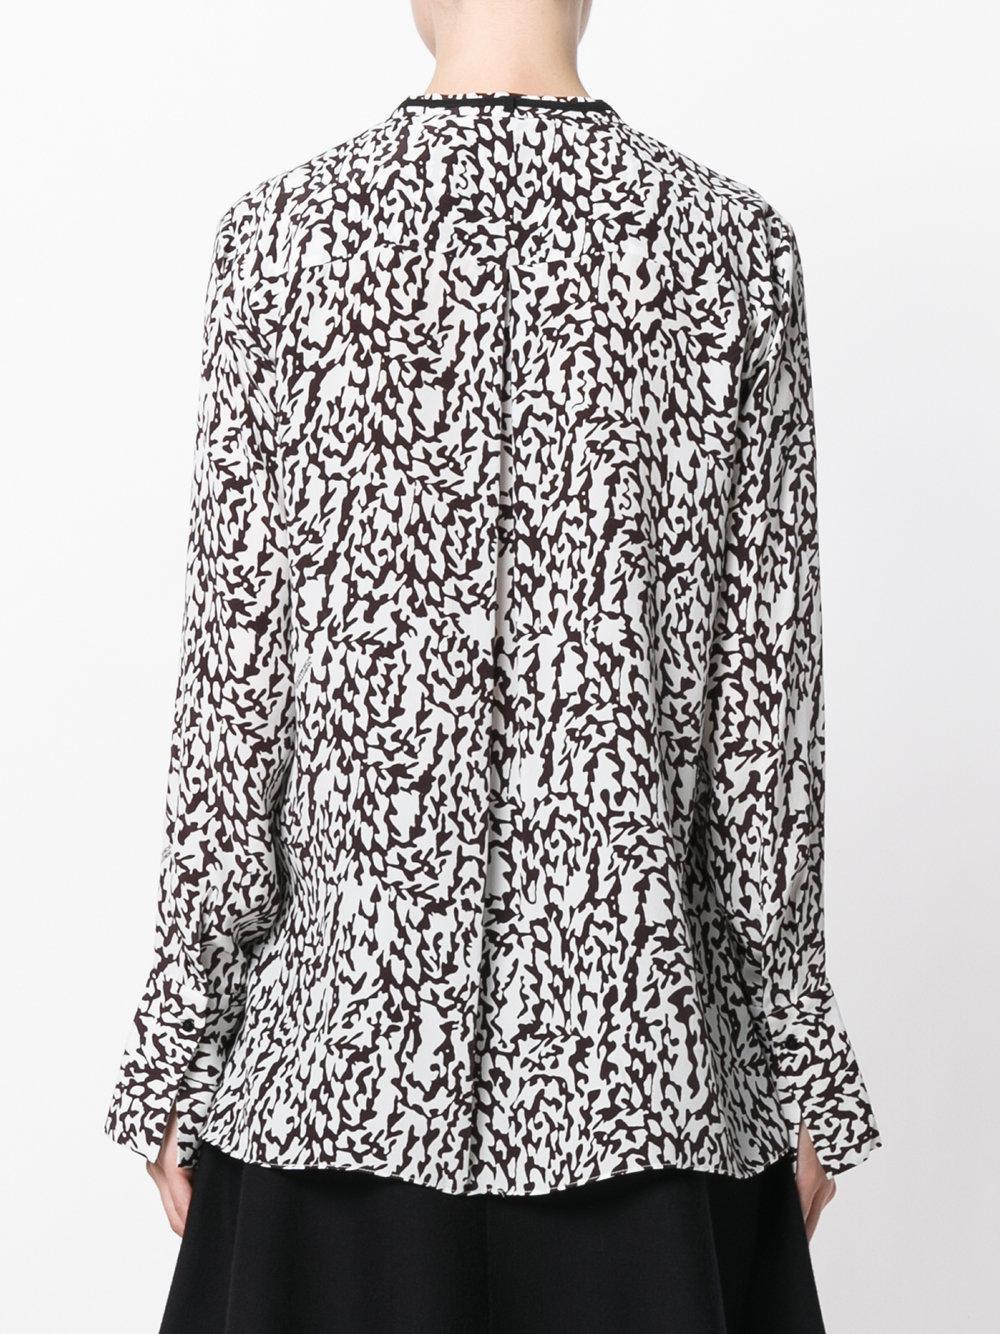 lyst dorothee schumacher patterned blouse in white. Black Bedroom Furniture Sets. Home Design Ideas